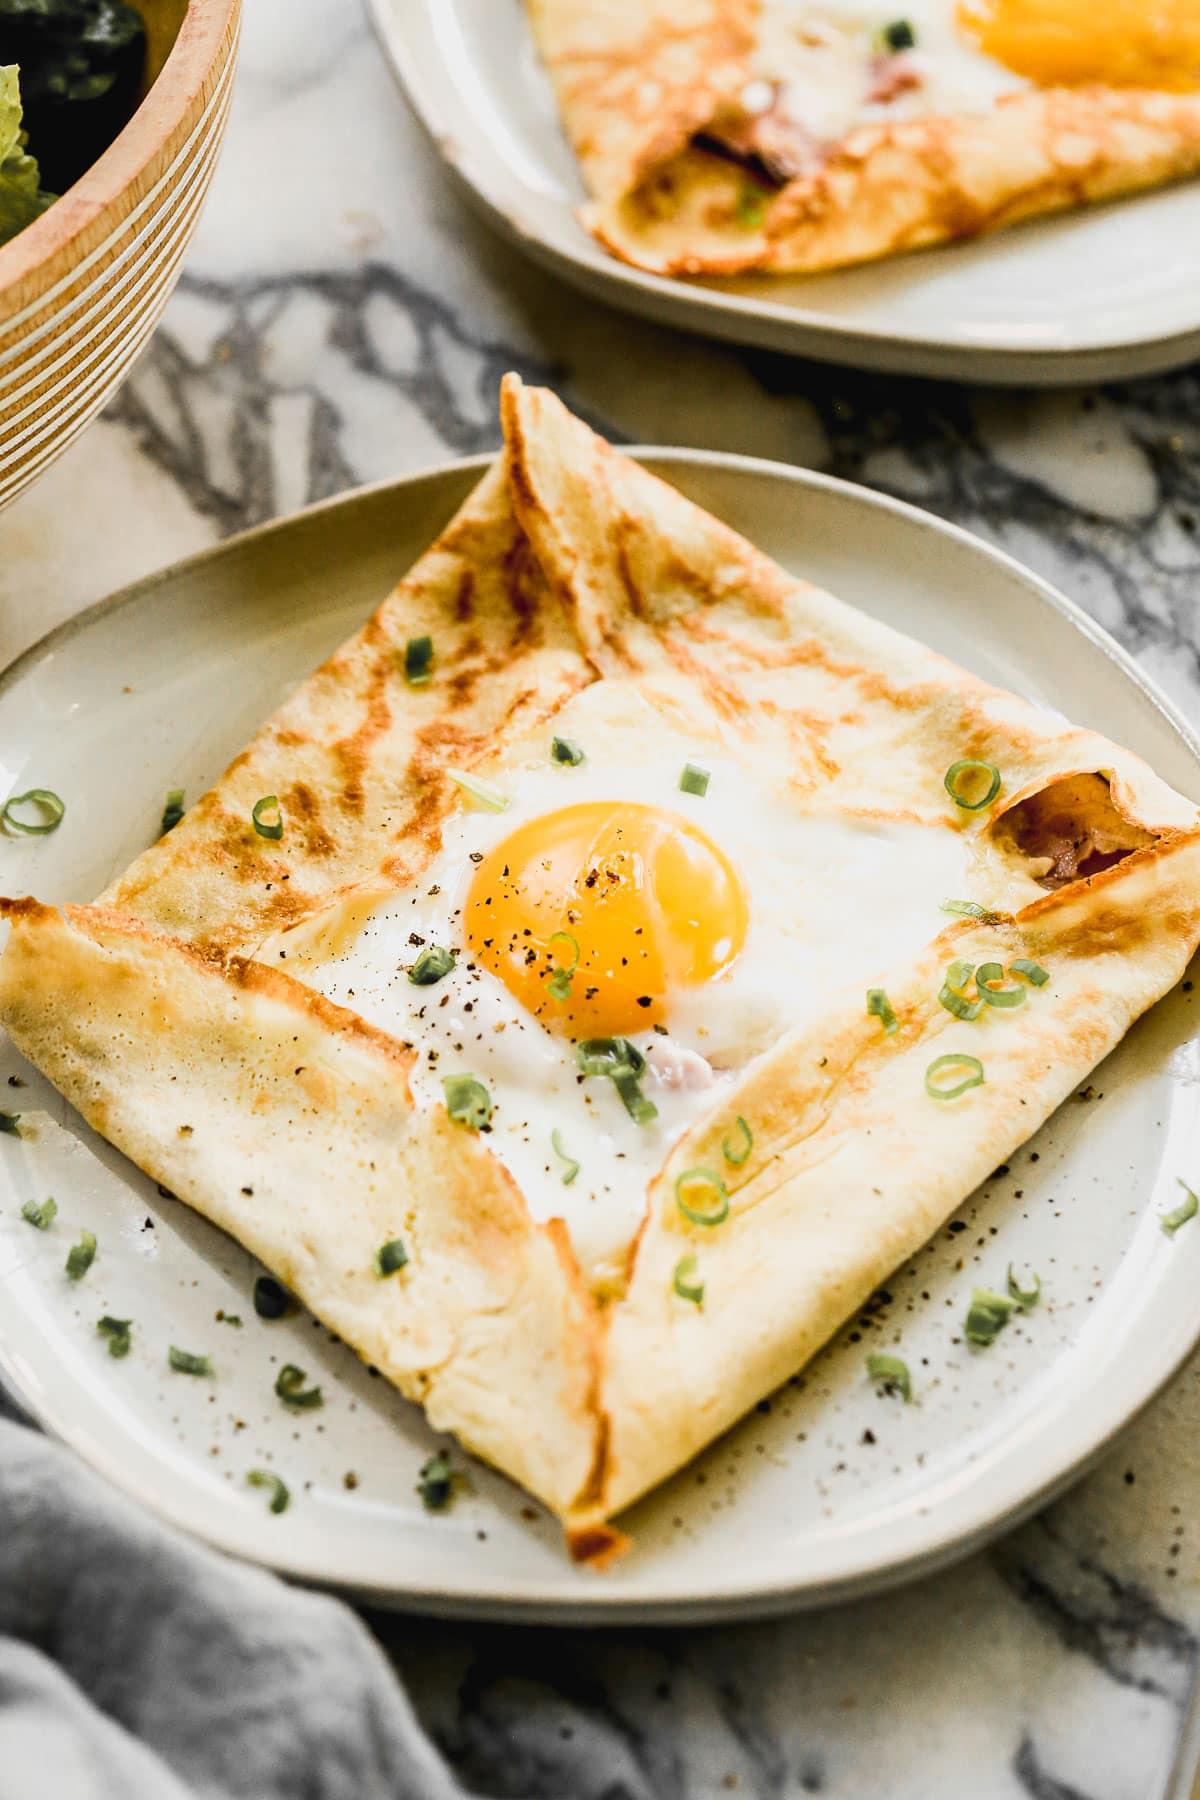 Savory crepes with egg